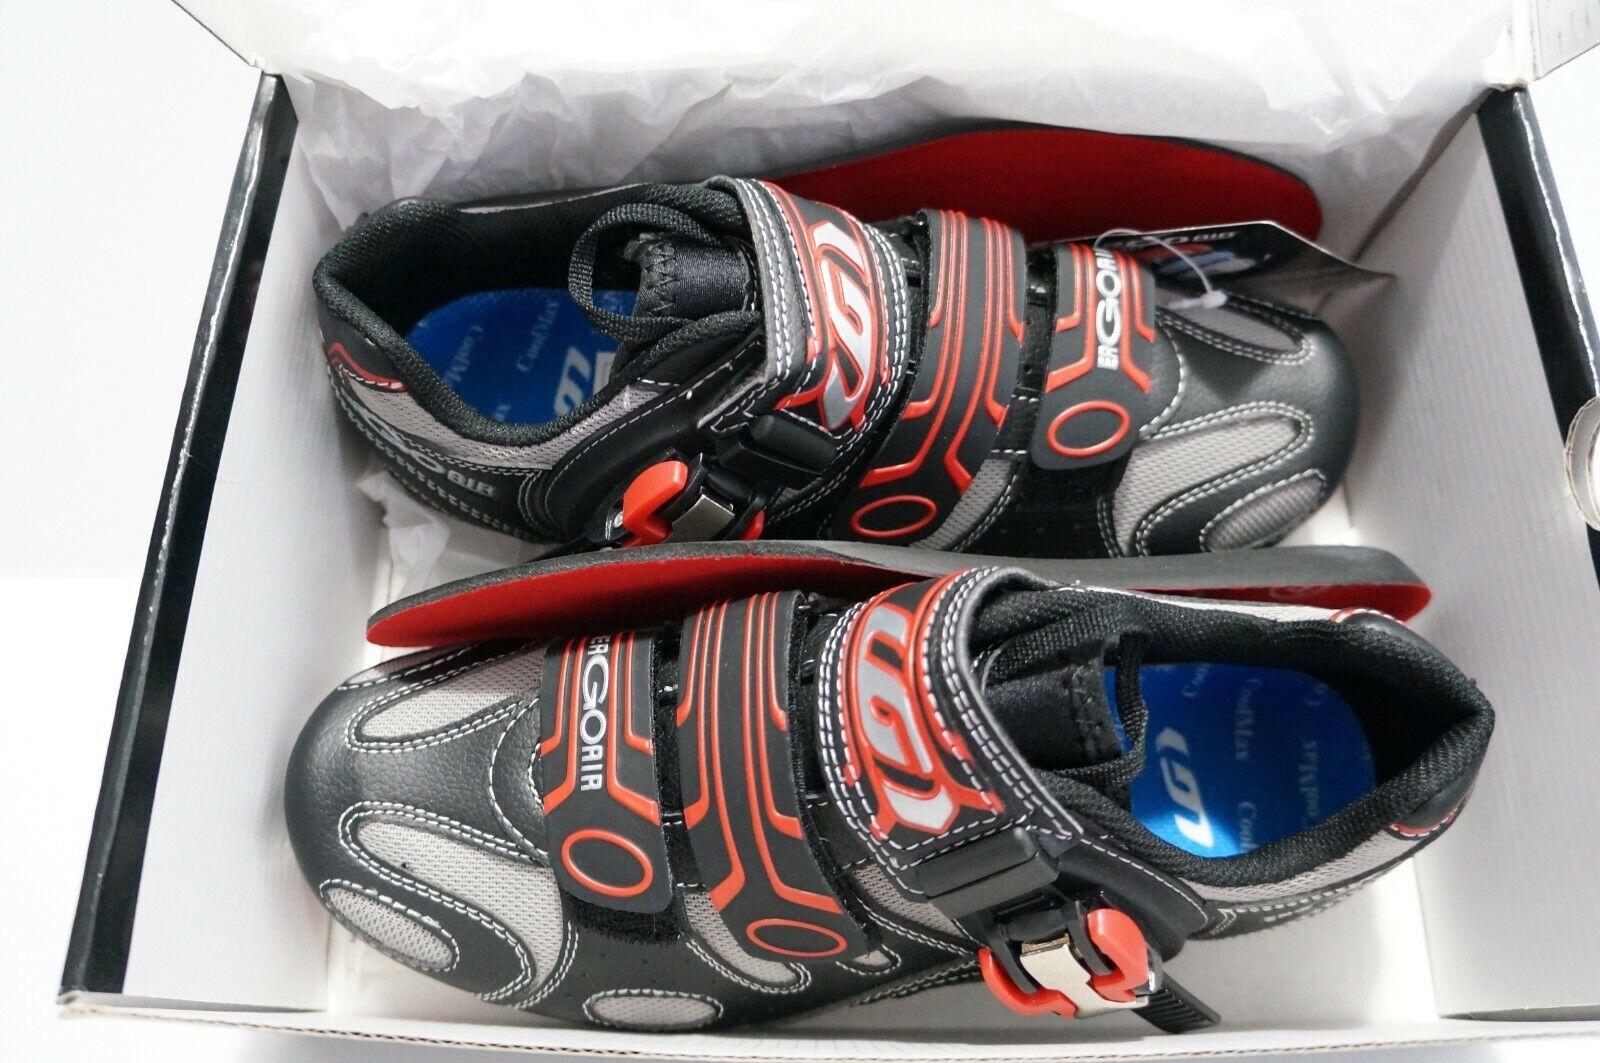 road bike shoes ergo lg air revo